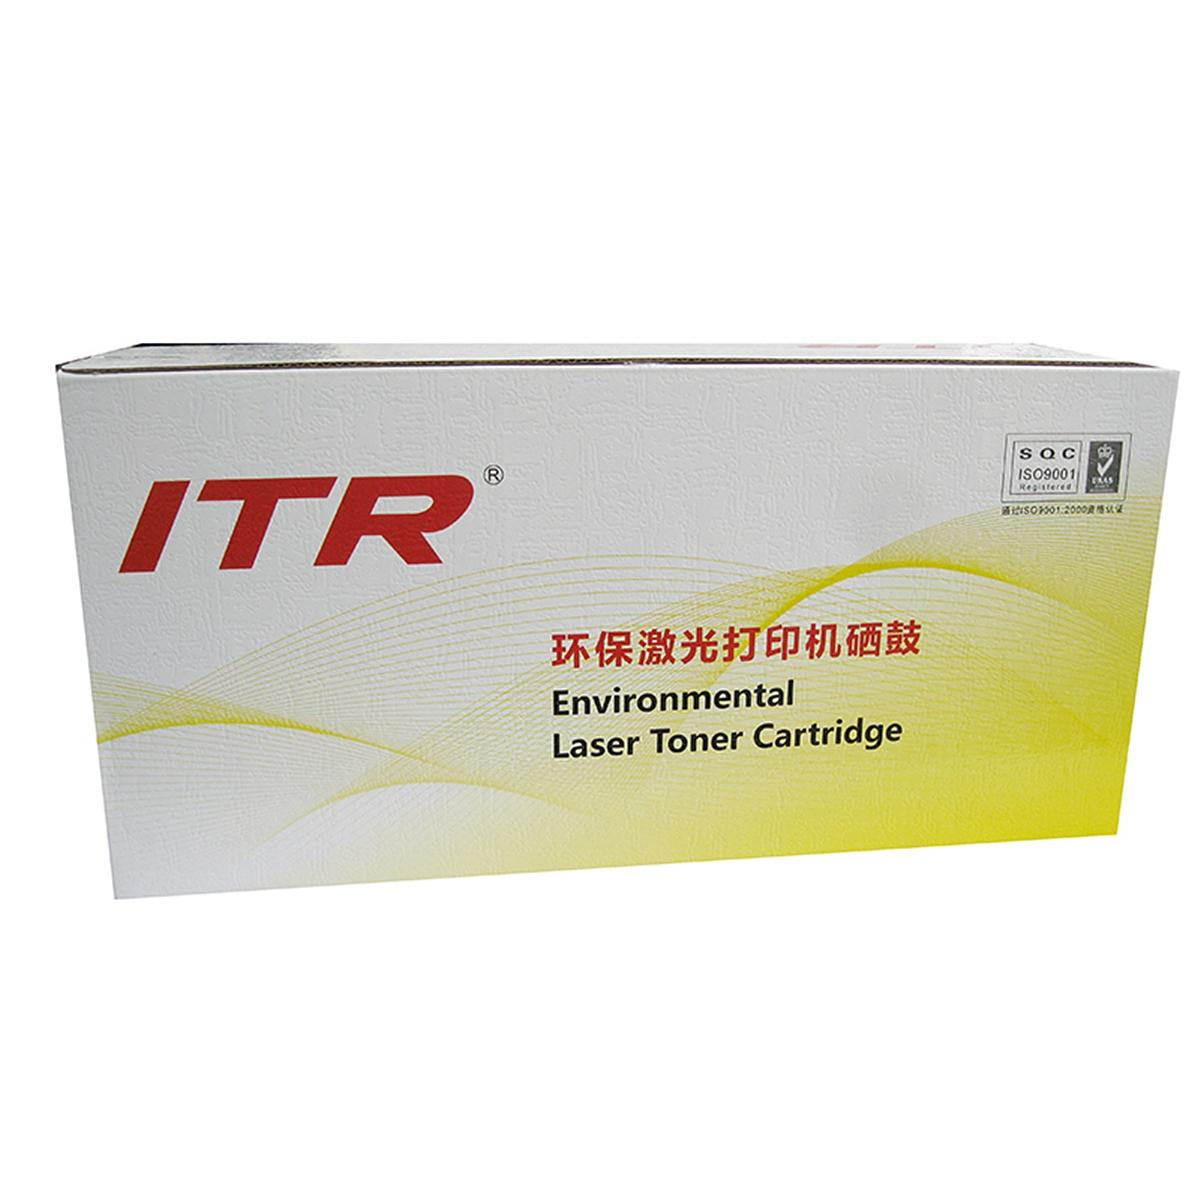 ITR-CN0491 兼容墨盒 (单位:盒) (适用于:EPSONSTYLUSPHOTOR210/R230/R310/RX510/RX630/R350)